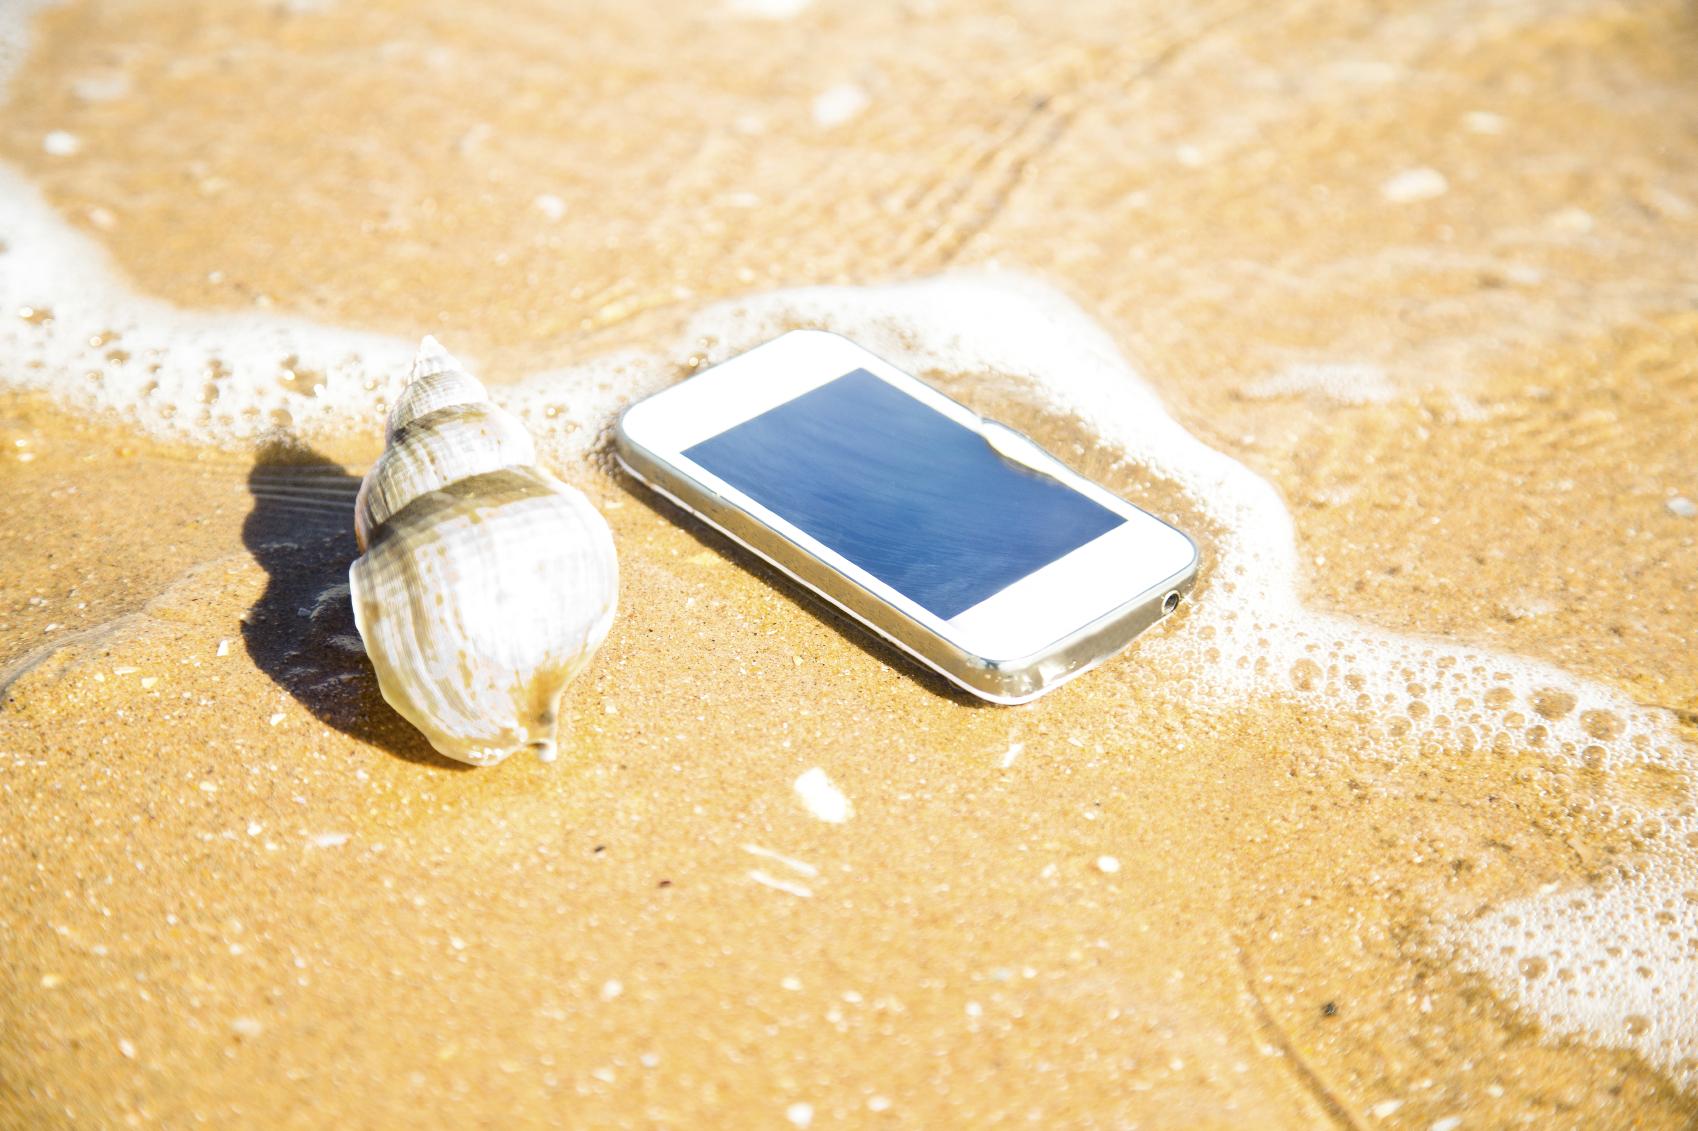 Gazelle summer phone